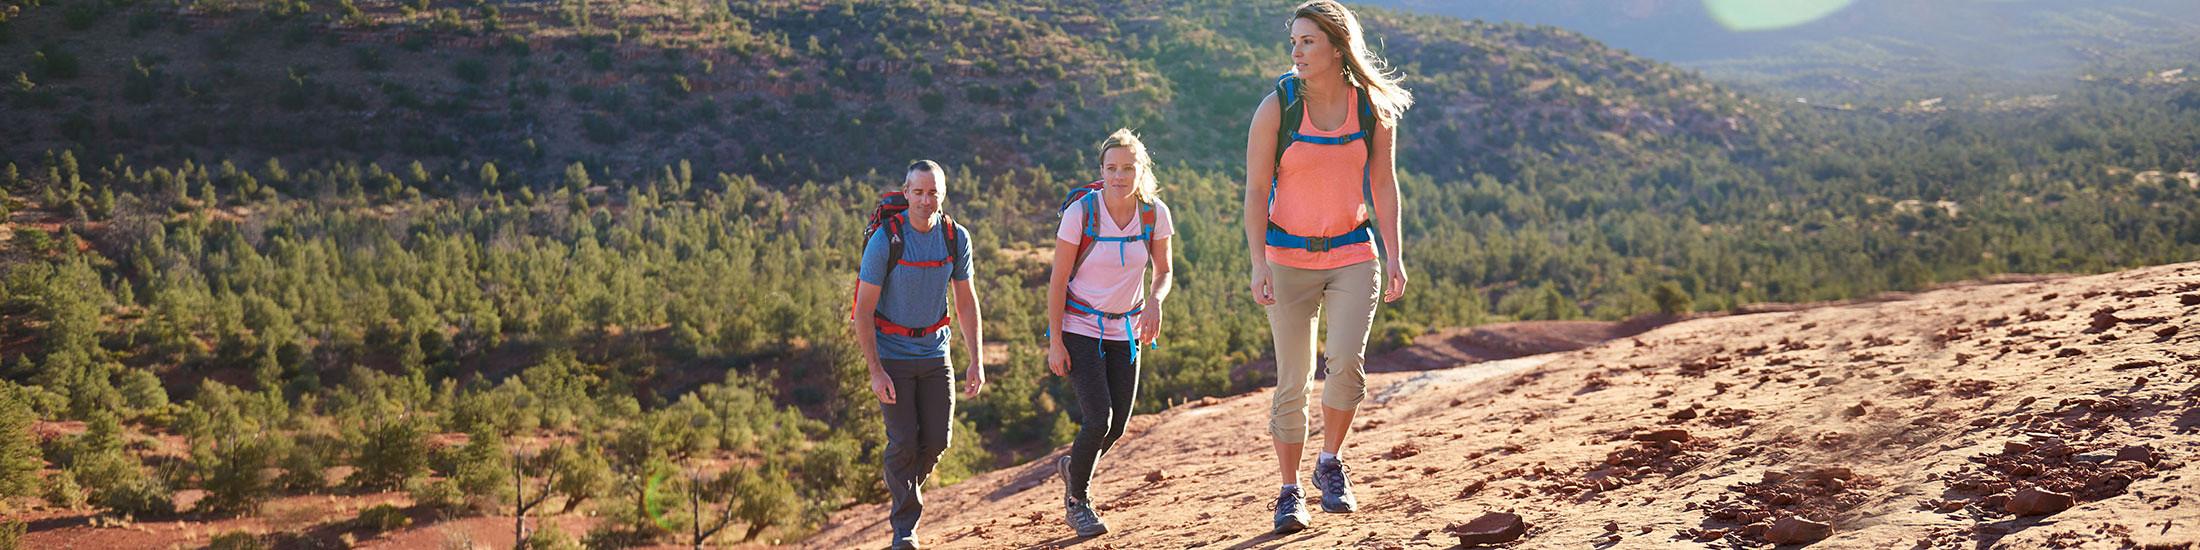 Three people hike up a hill in Sedona, AZ